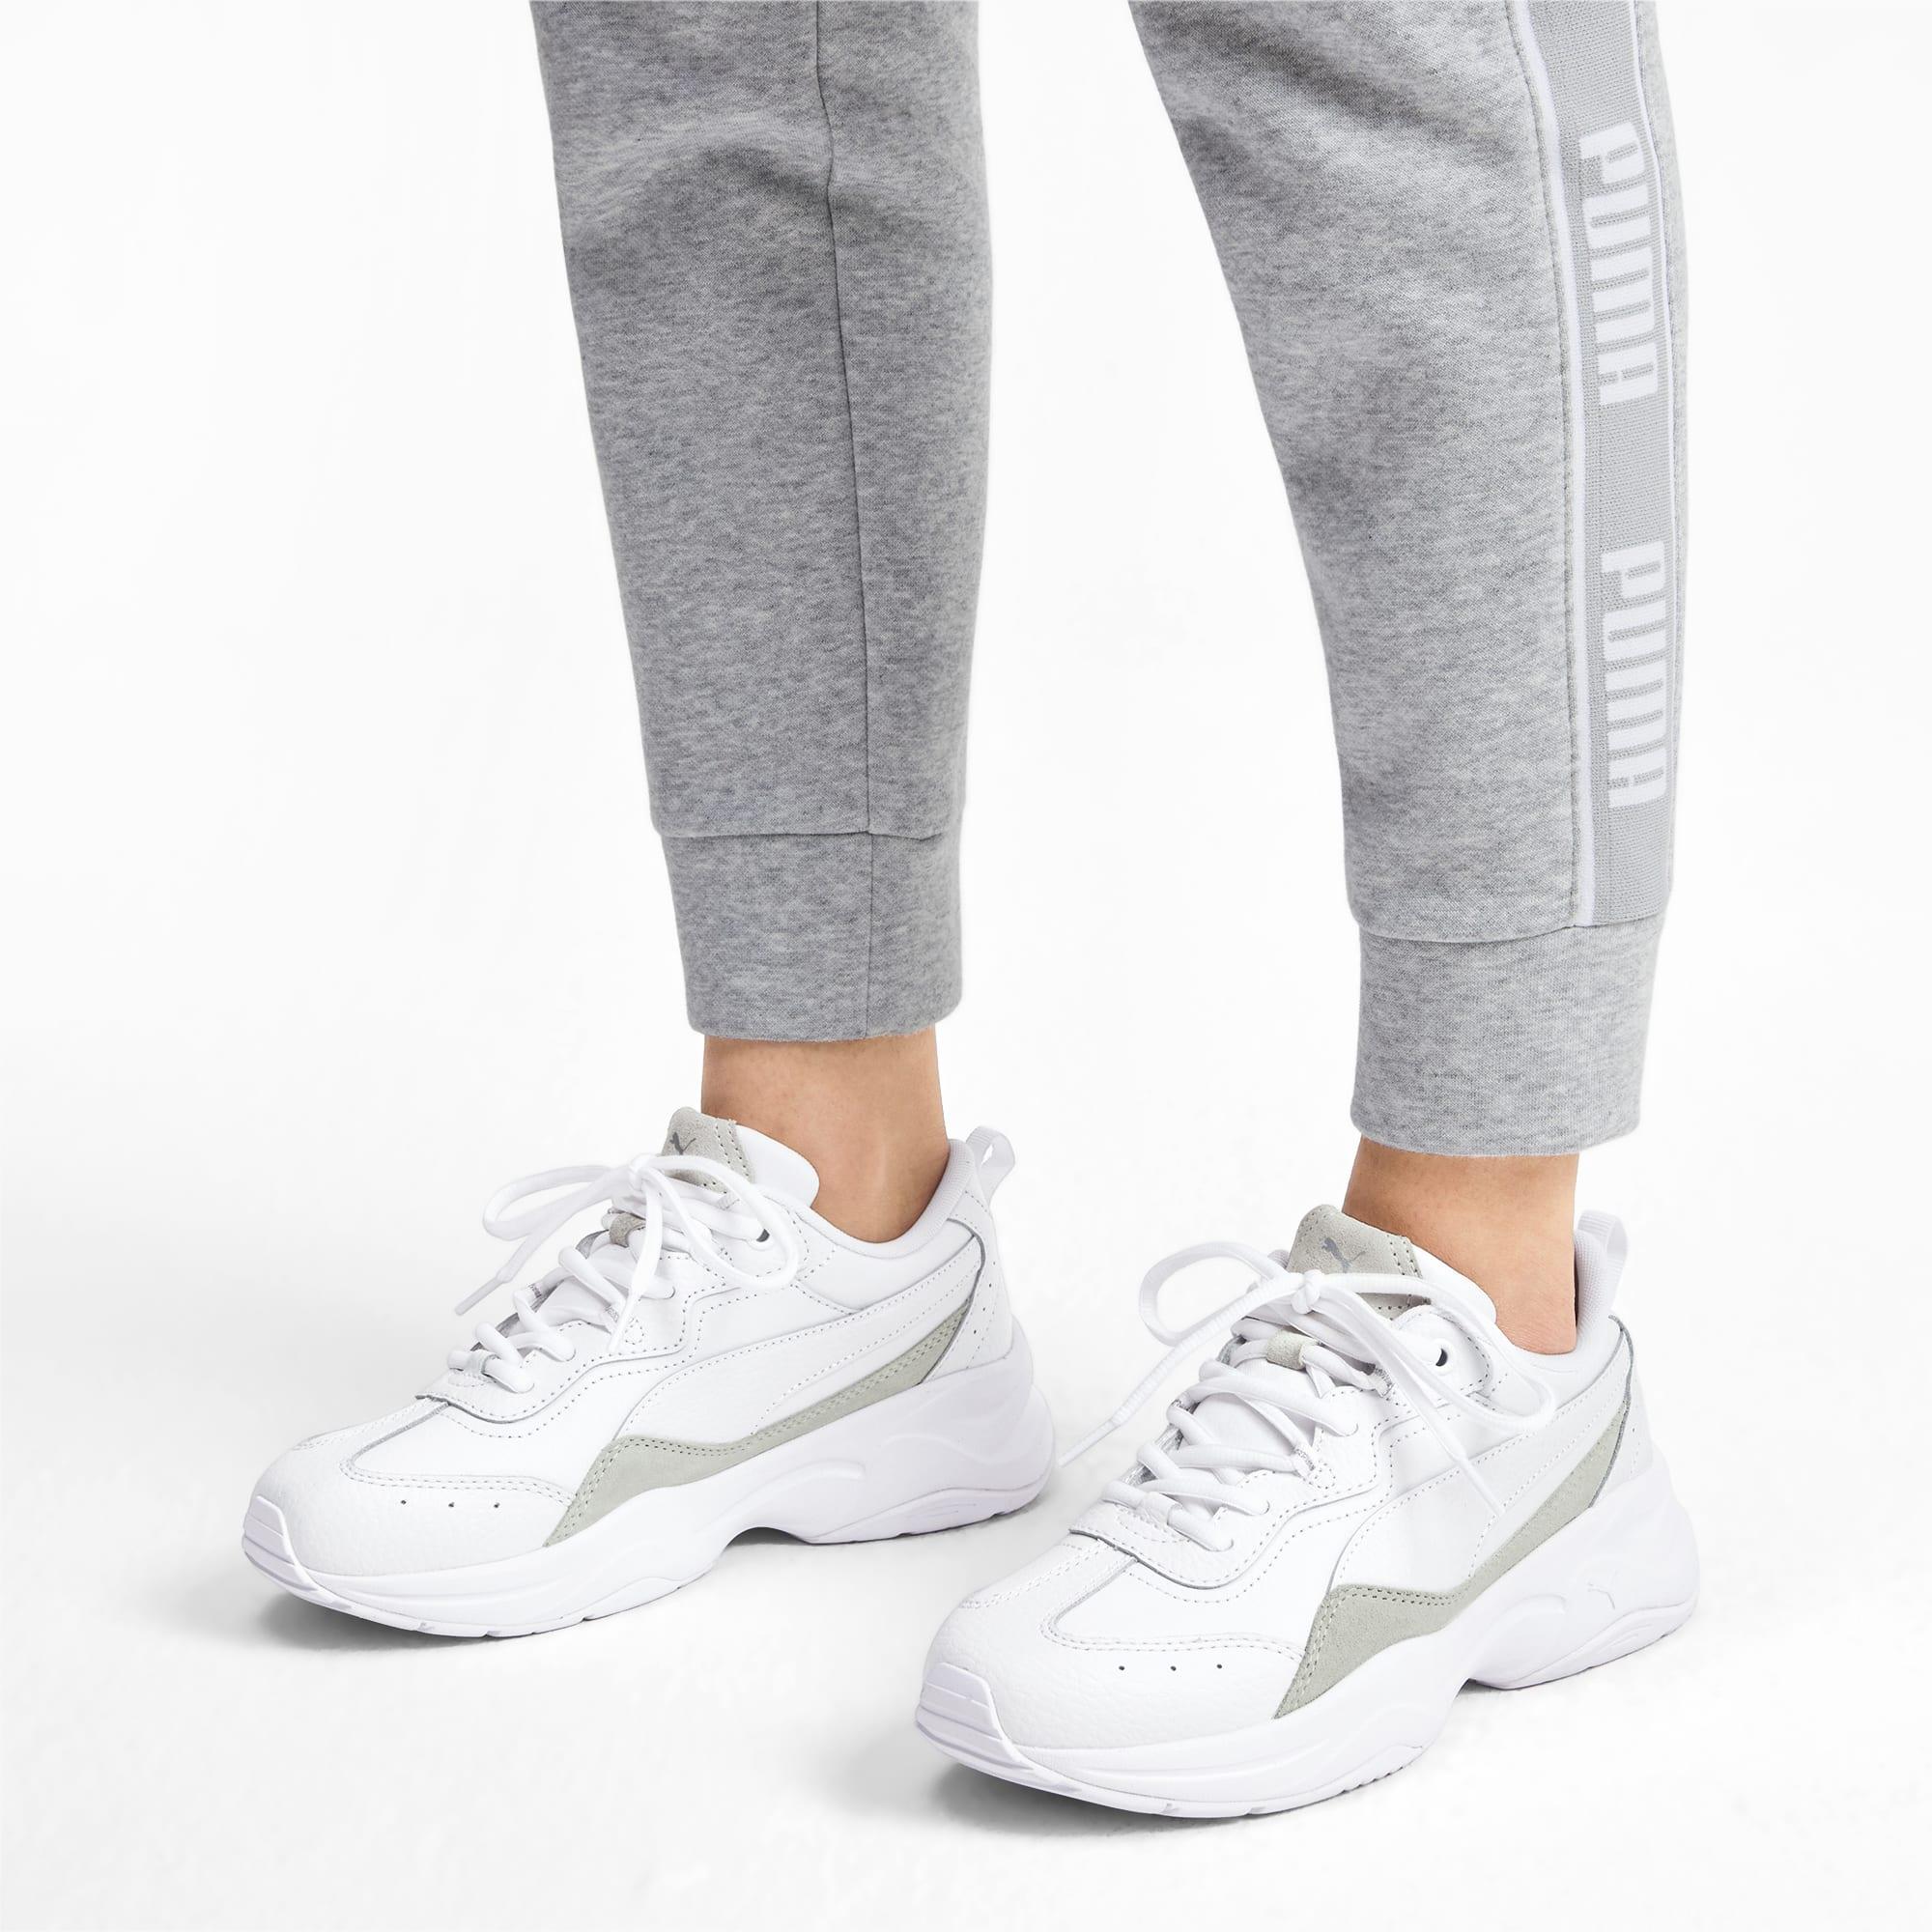 Cilia Lux Damen Trainingsschuhe | Puma White Puma White